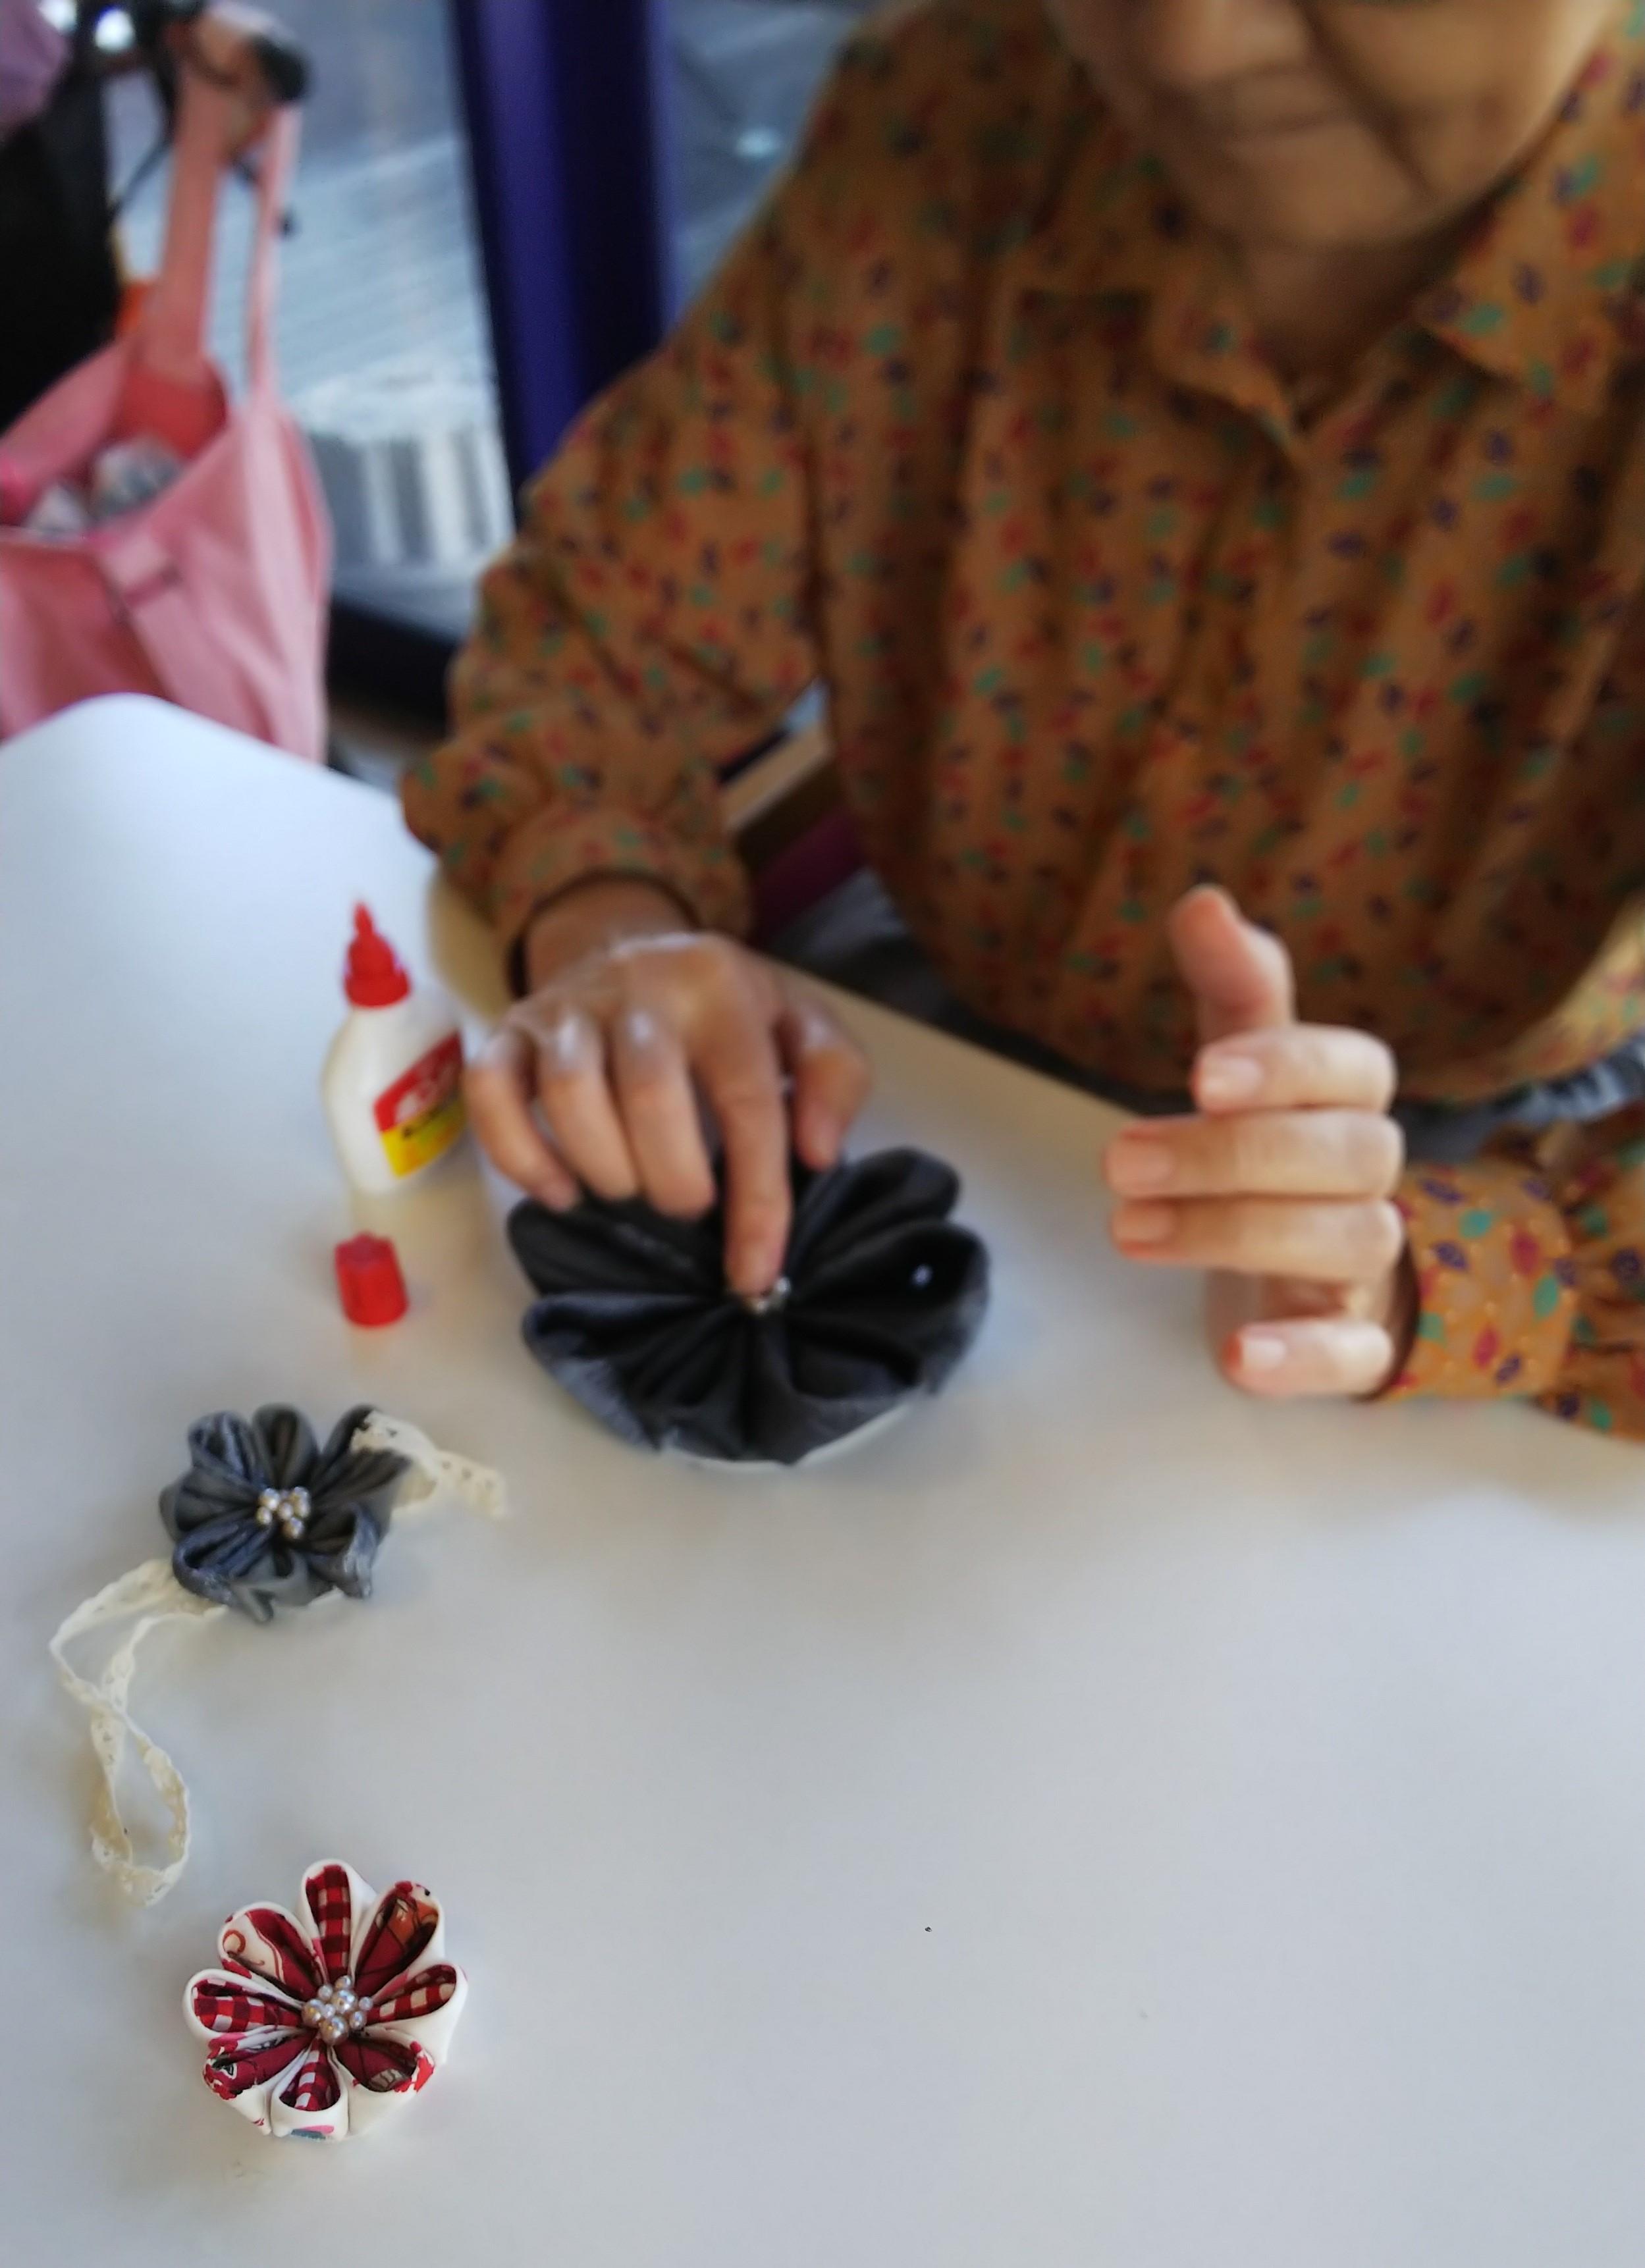 ●ZAMPU最新情報●社会福祉法人善光会様での手芸レクリエーション